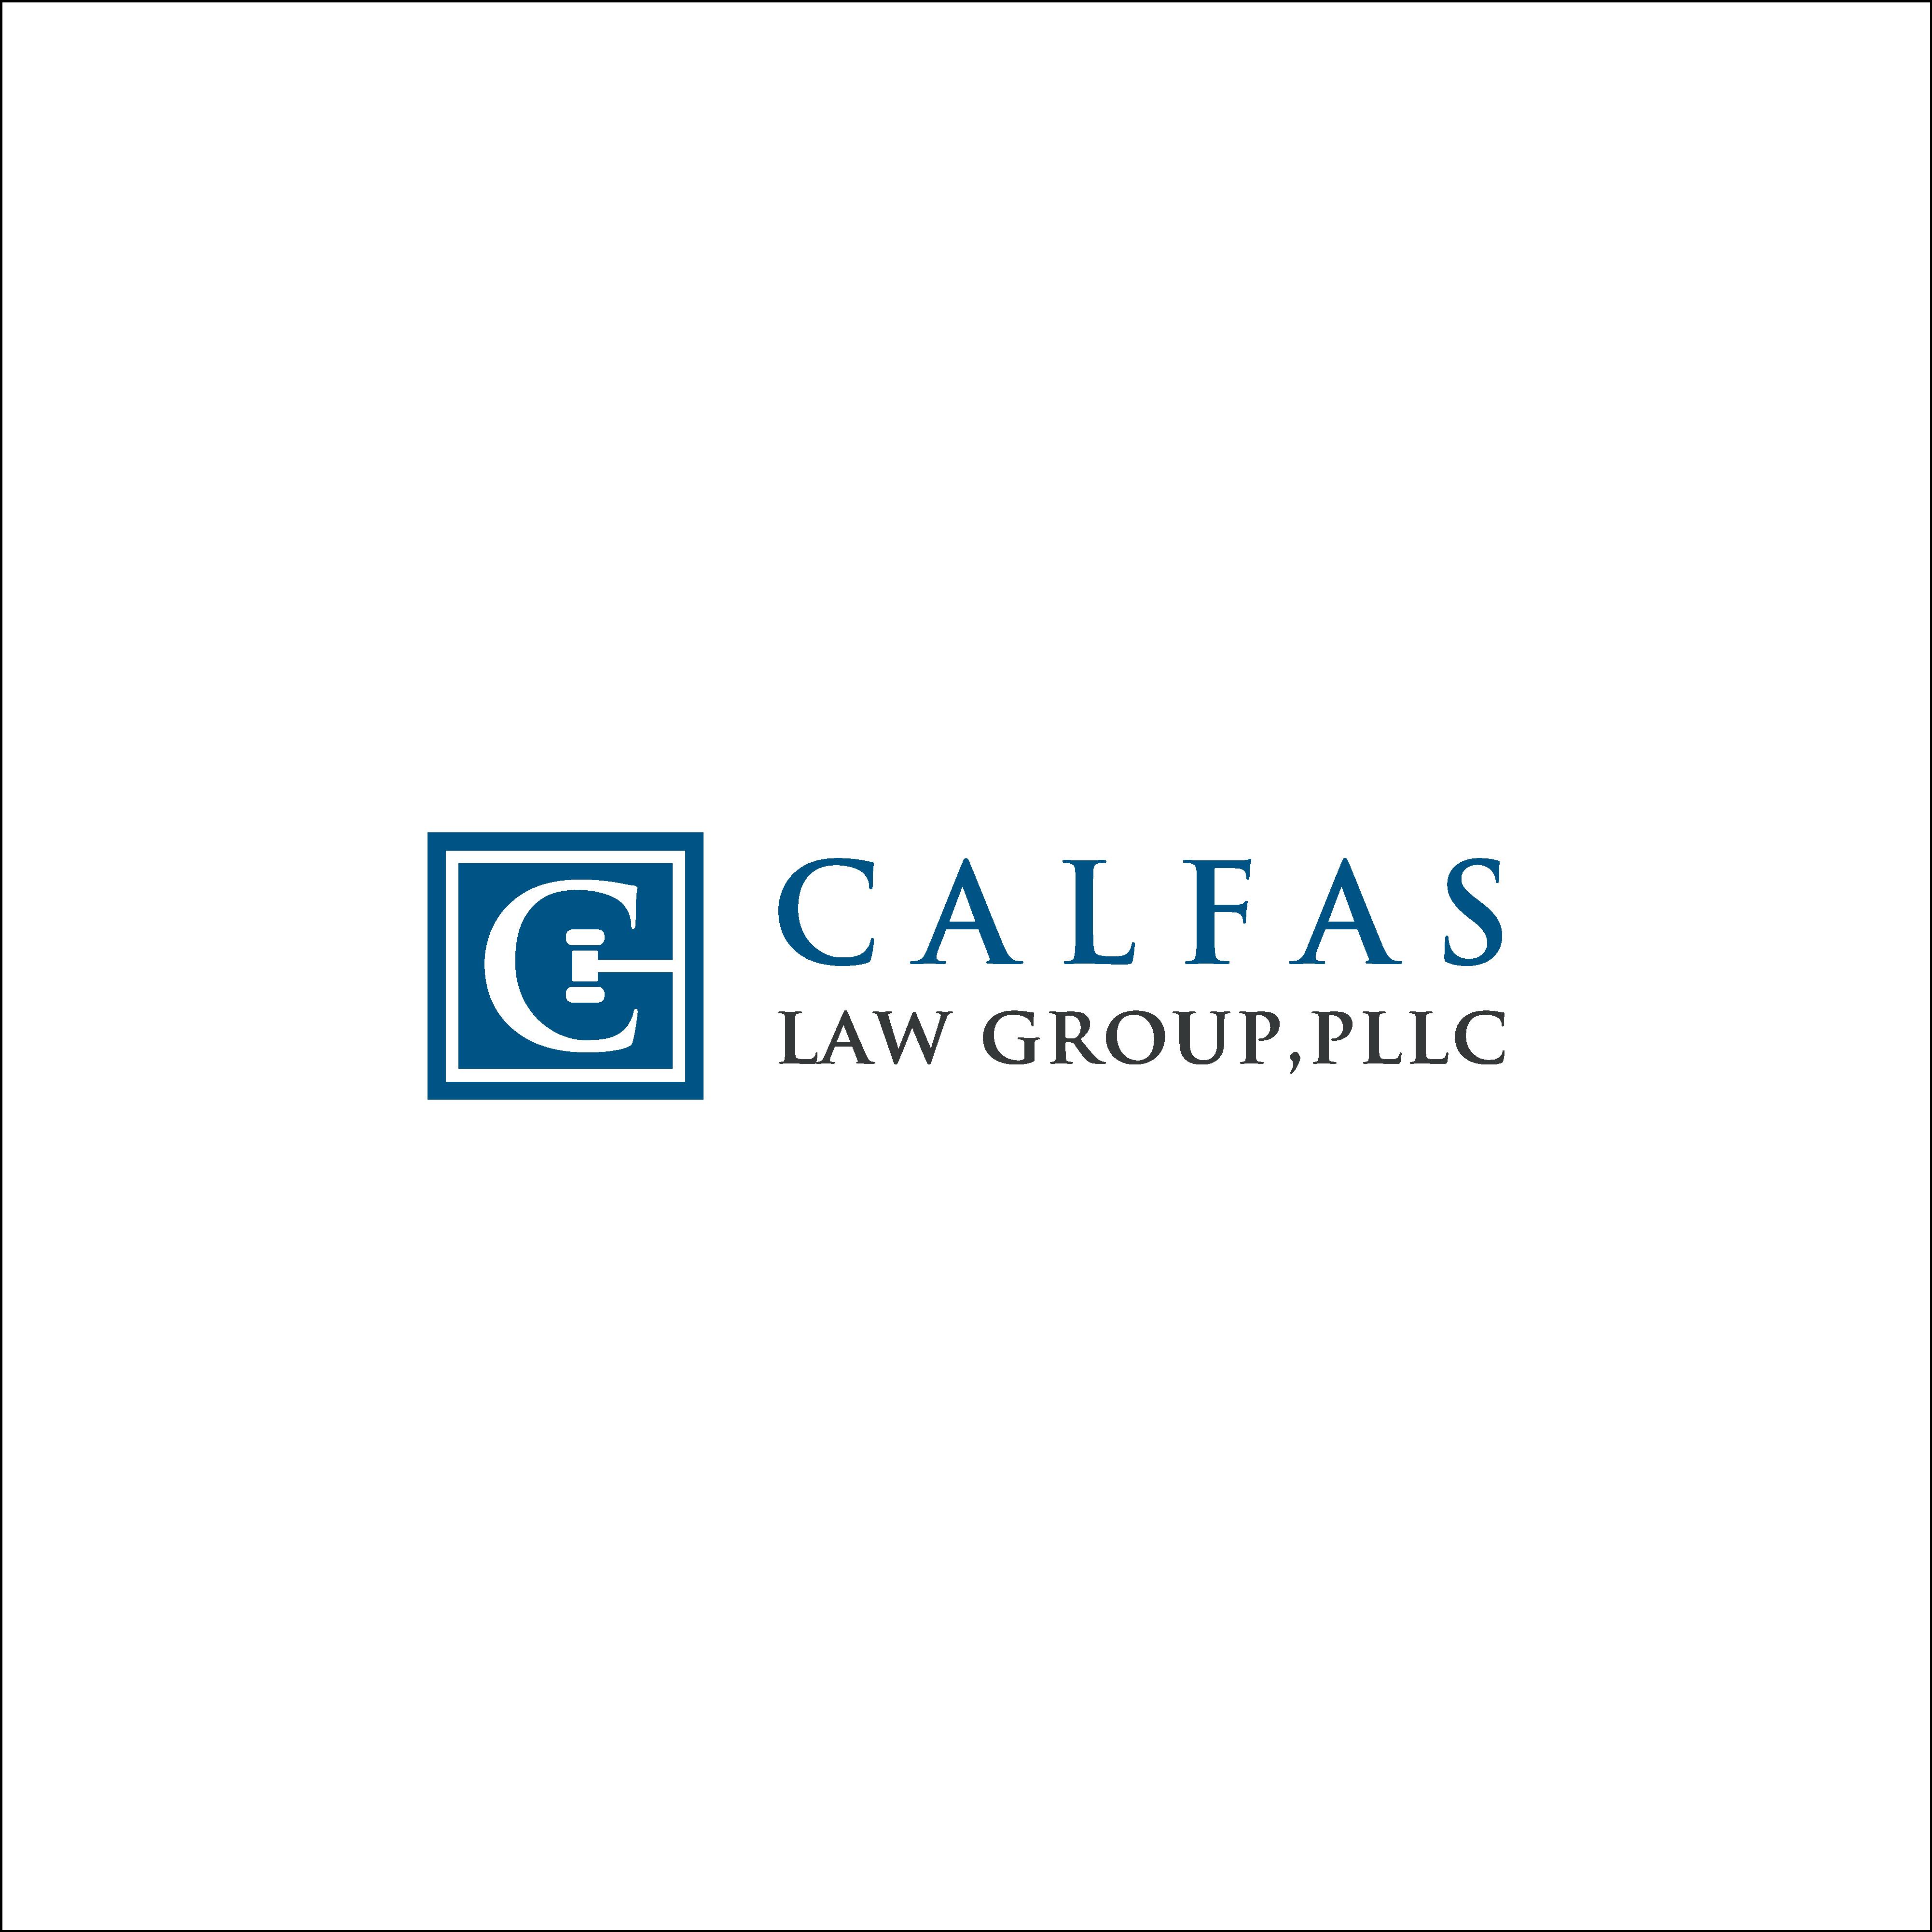 Calfas Law Group, PLLC